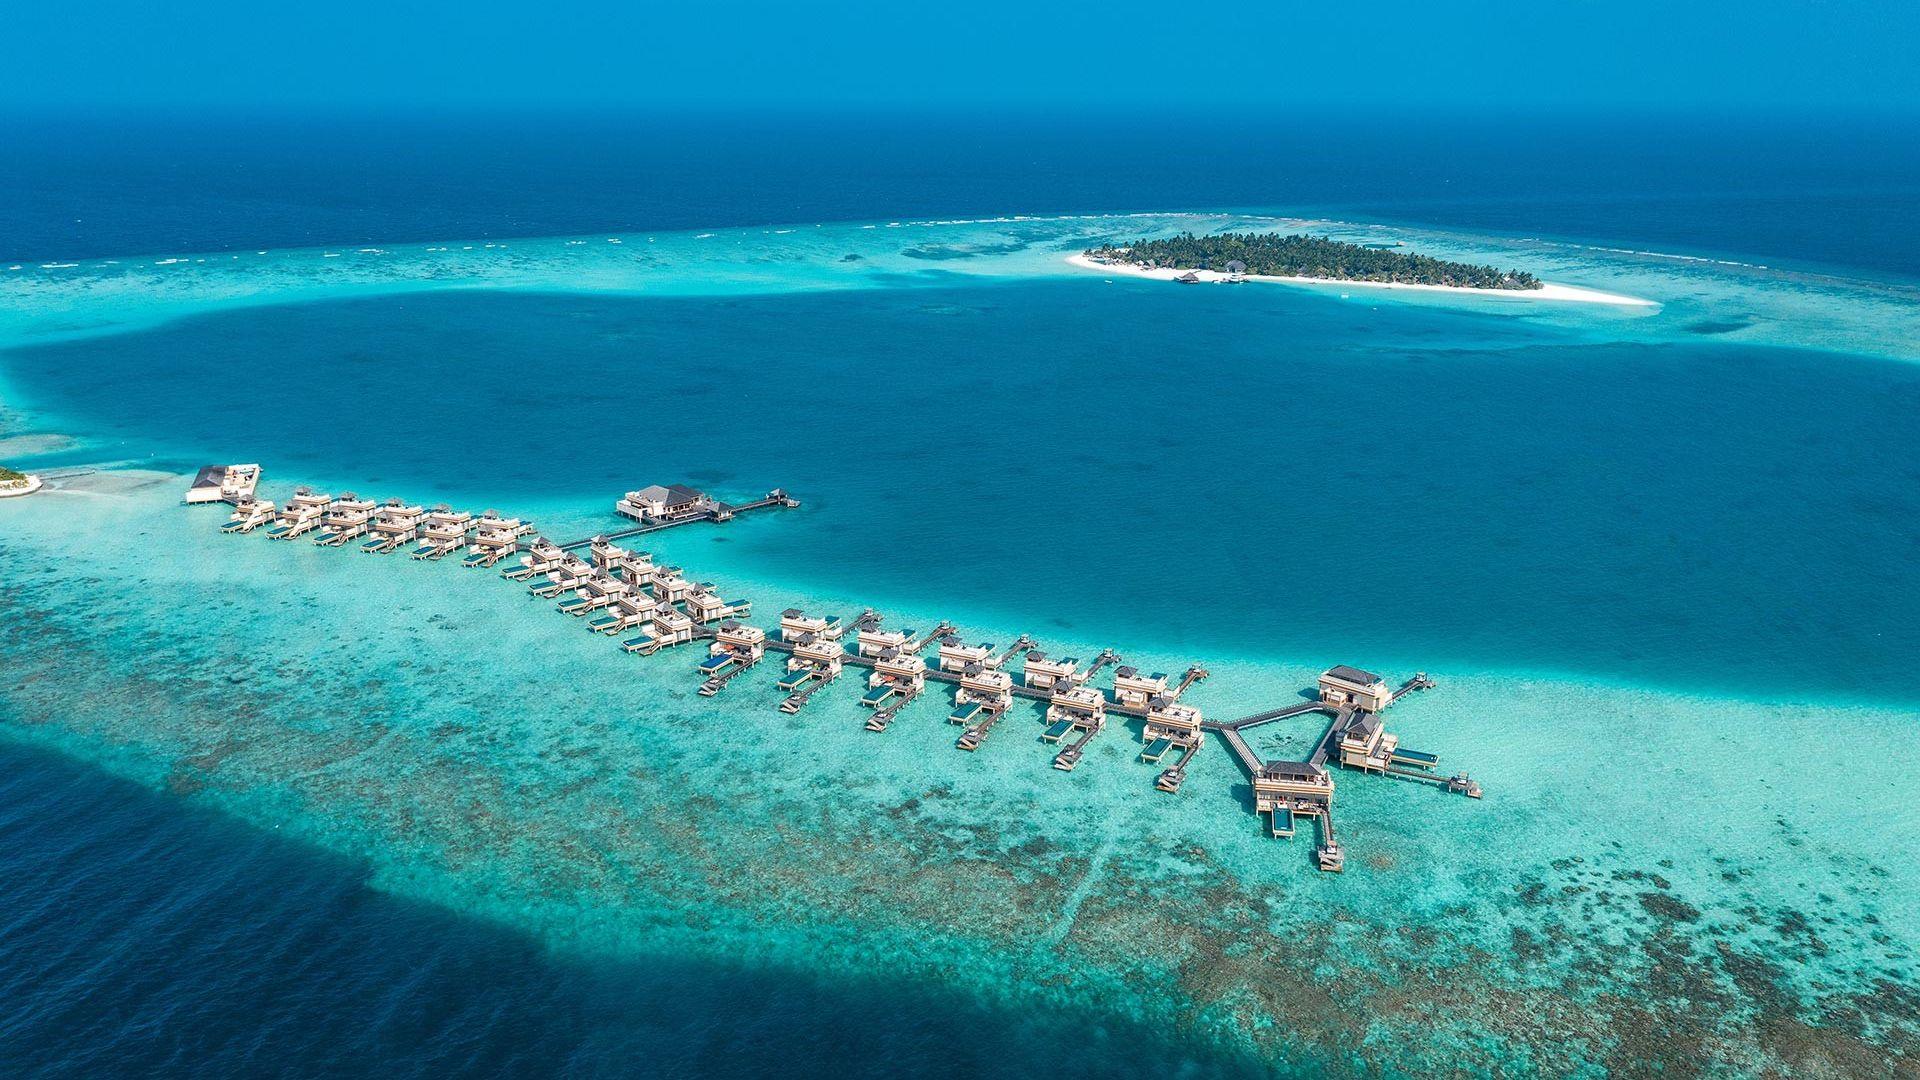 Sejur charter All Inclusive Maldive, 10 zile - Ianuarie 2022